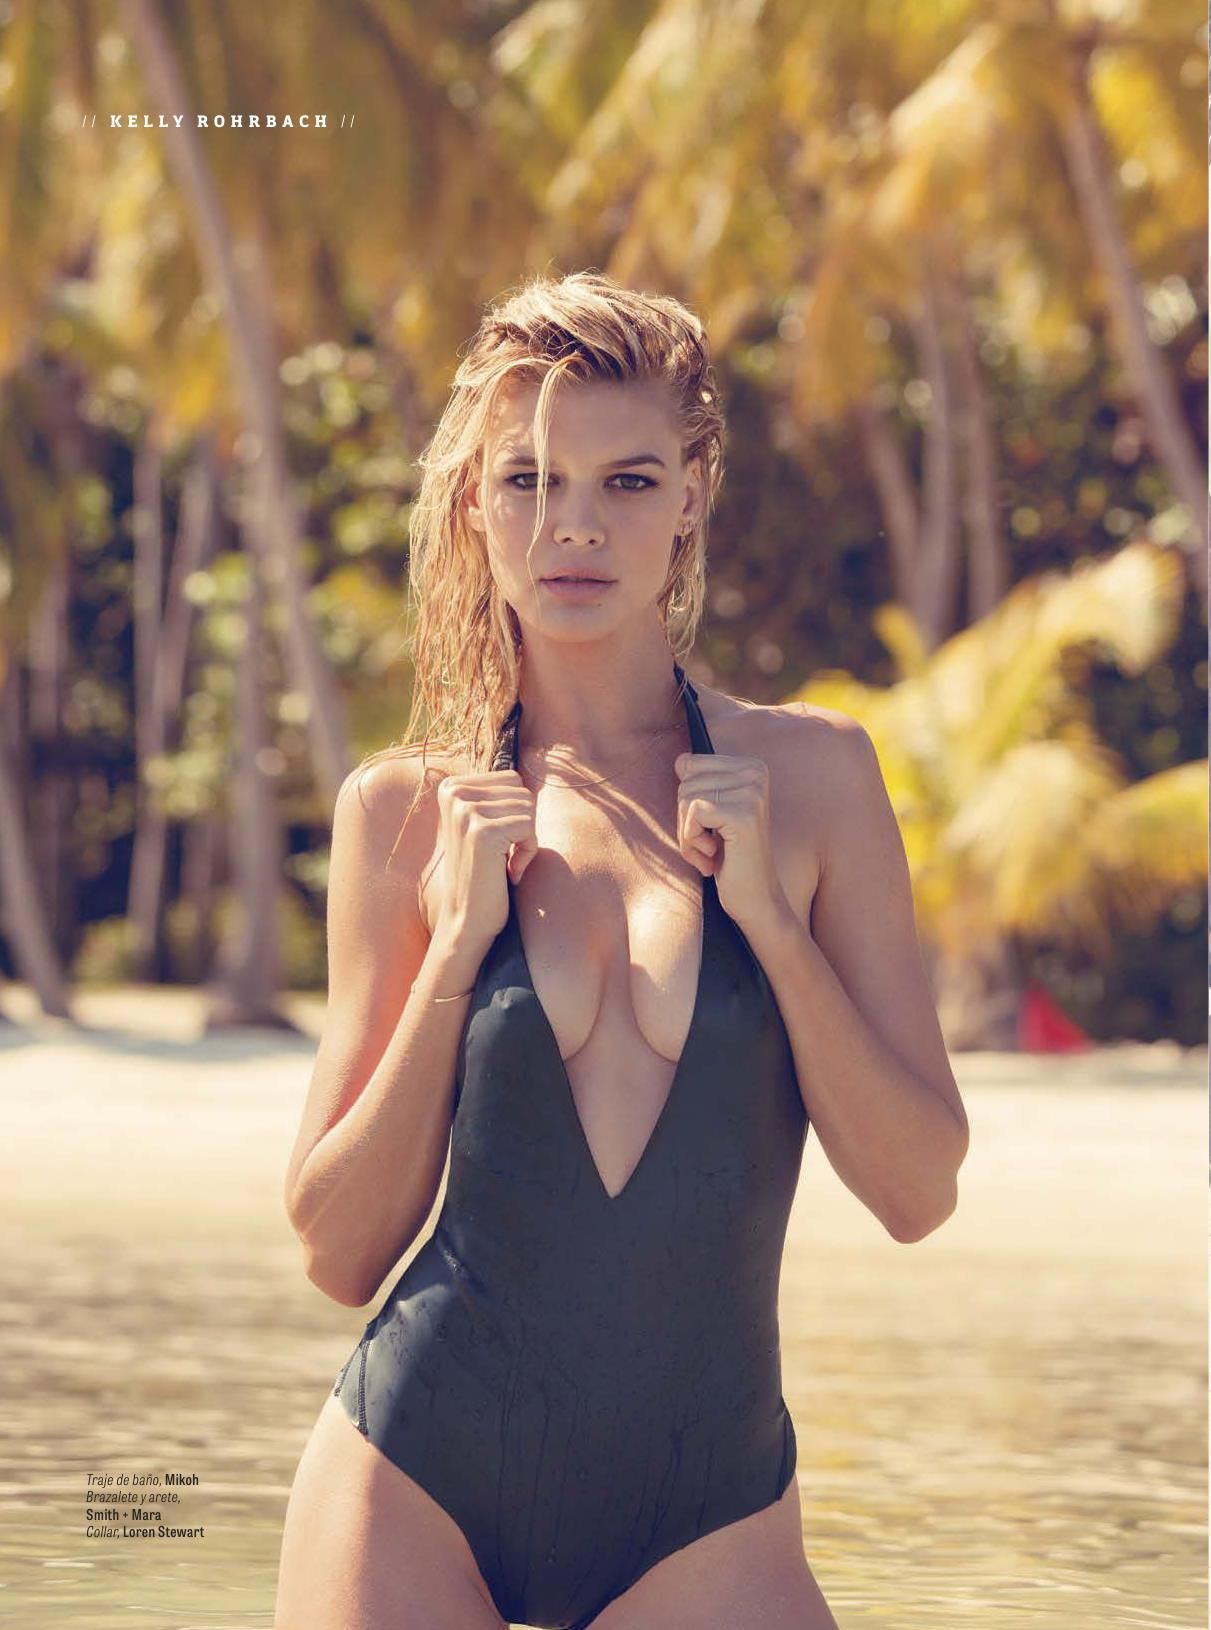 Kelly-Rohrbach-Sexy-9